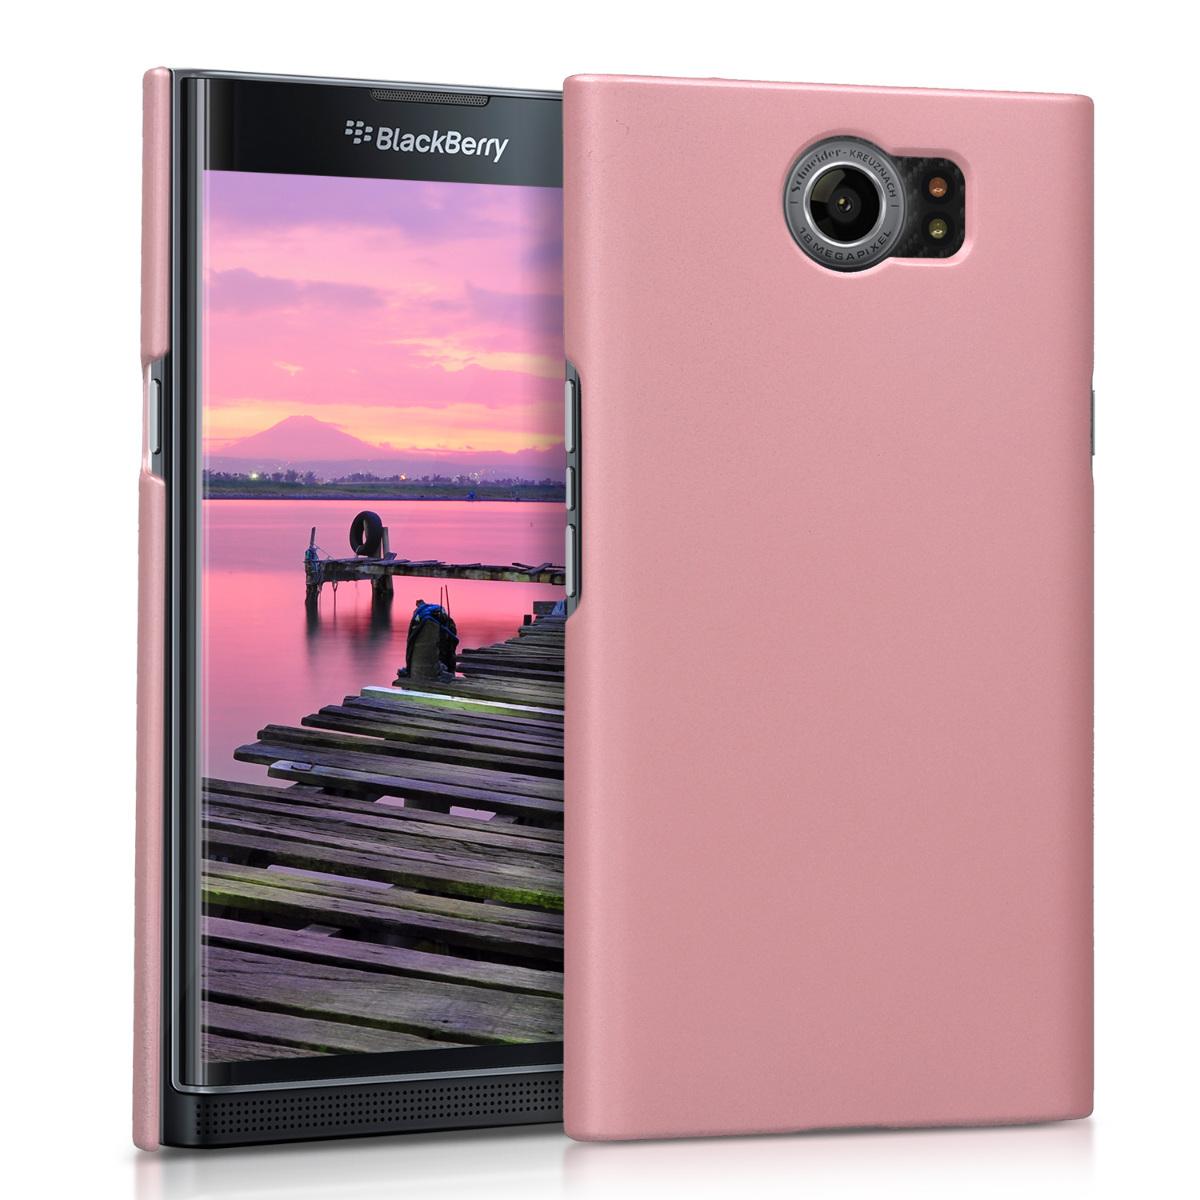 KW Slim Anti-Slip Cover - Σκληρή Θήκη Καουτσούκ Blackberry Priv - Ροζ (42624.89)